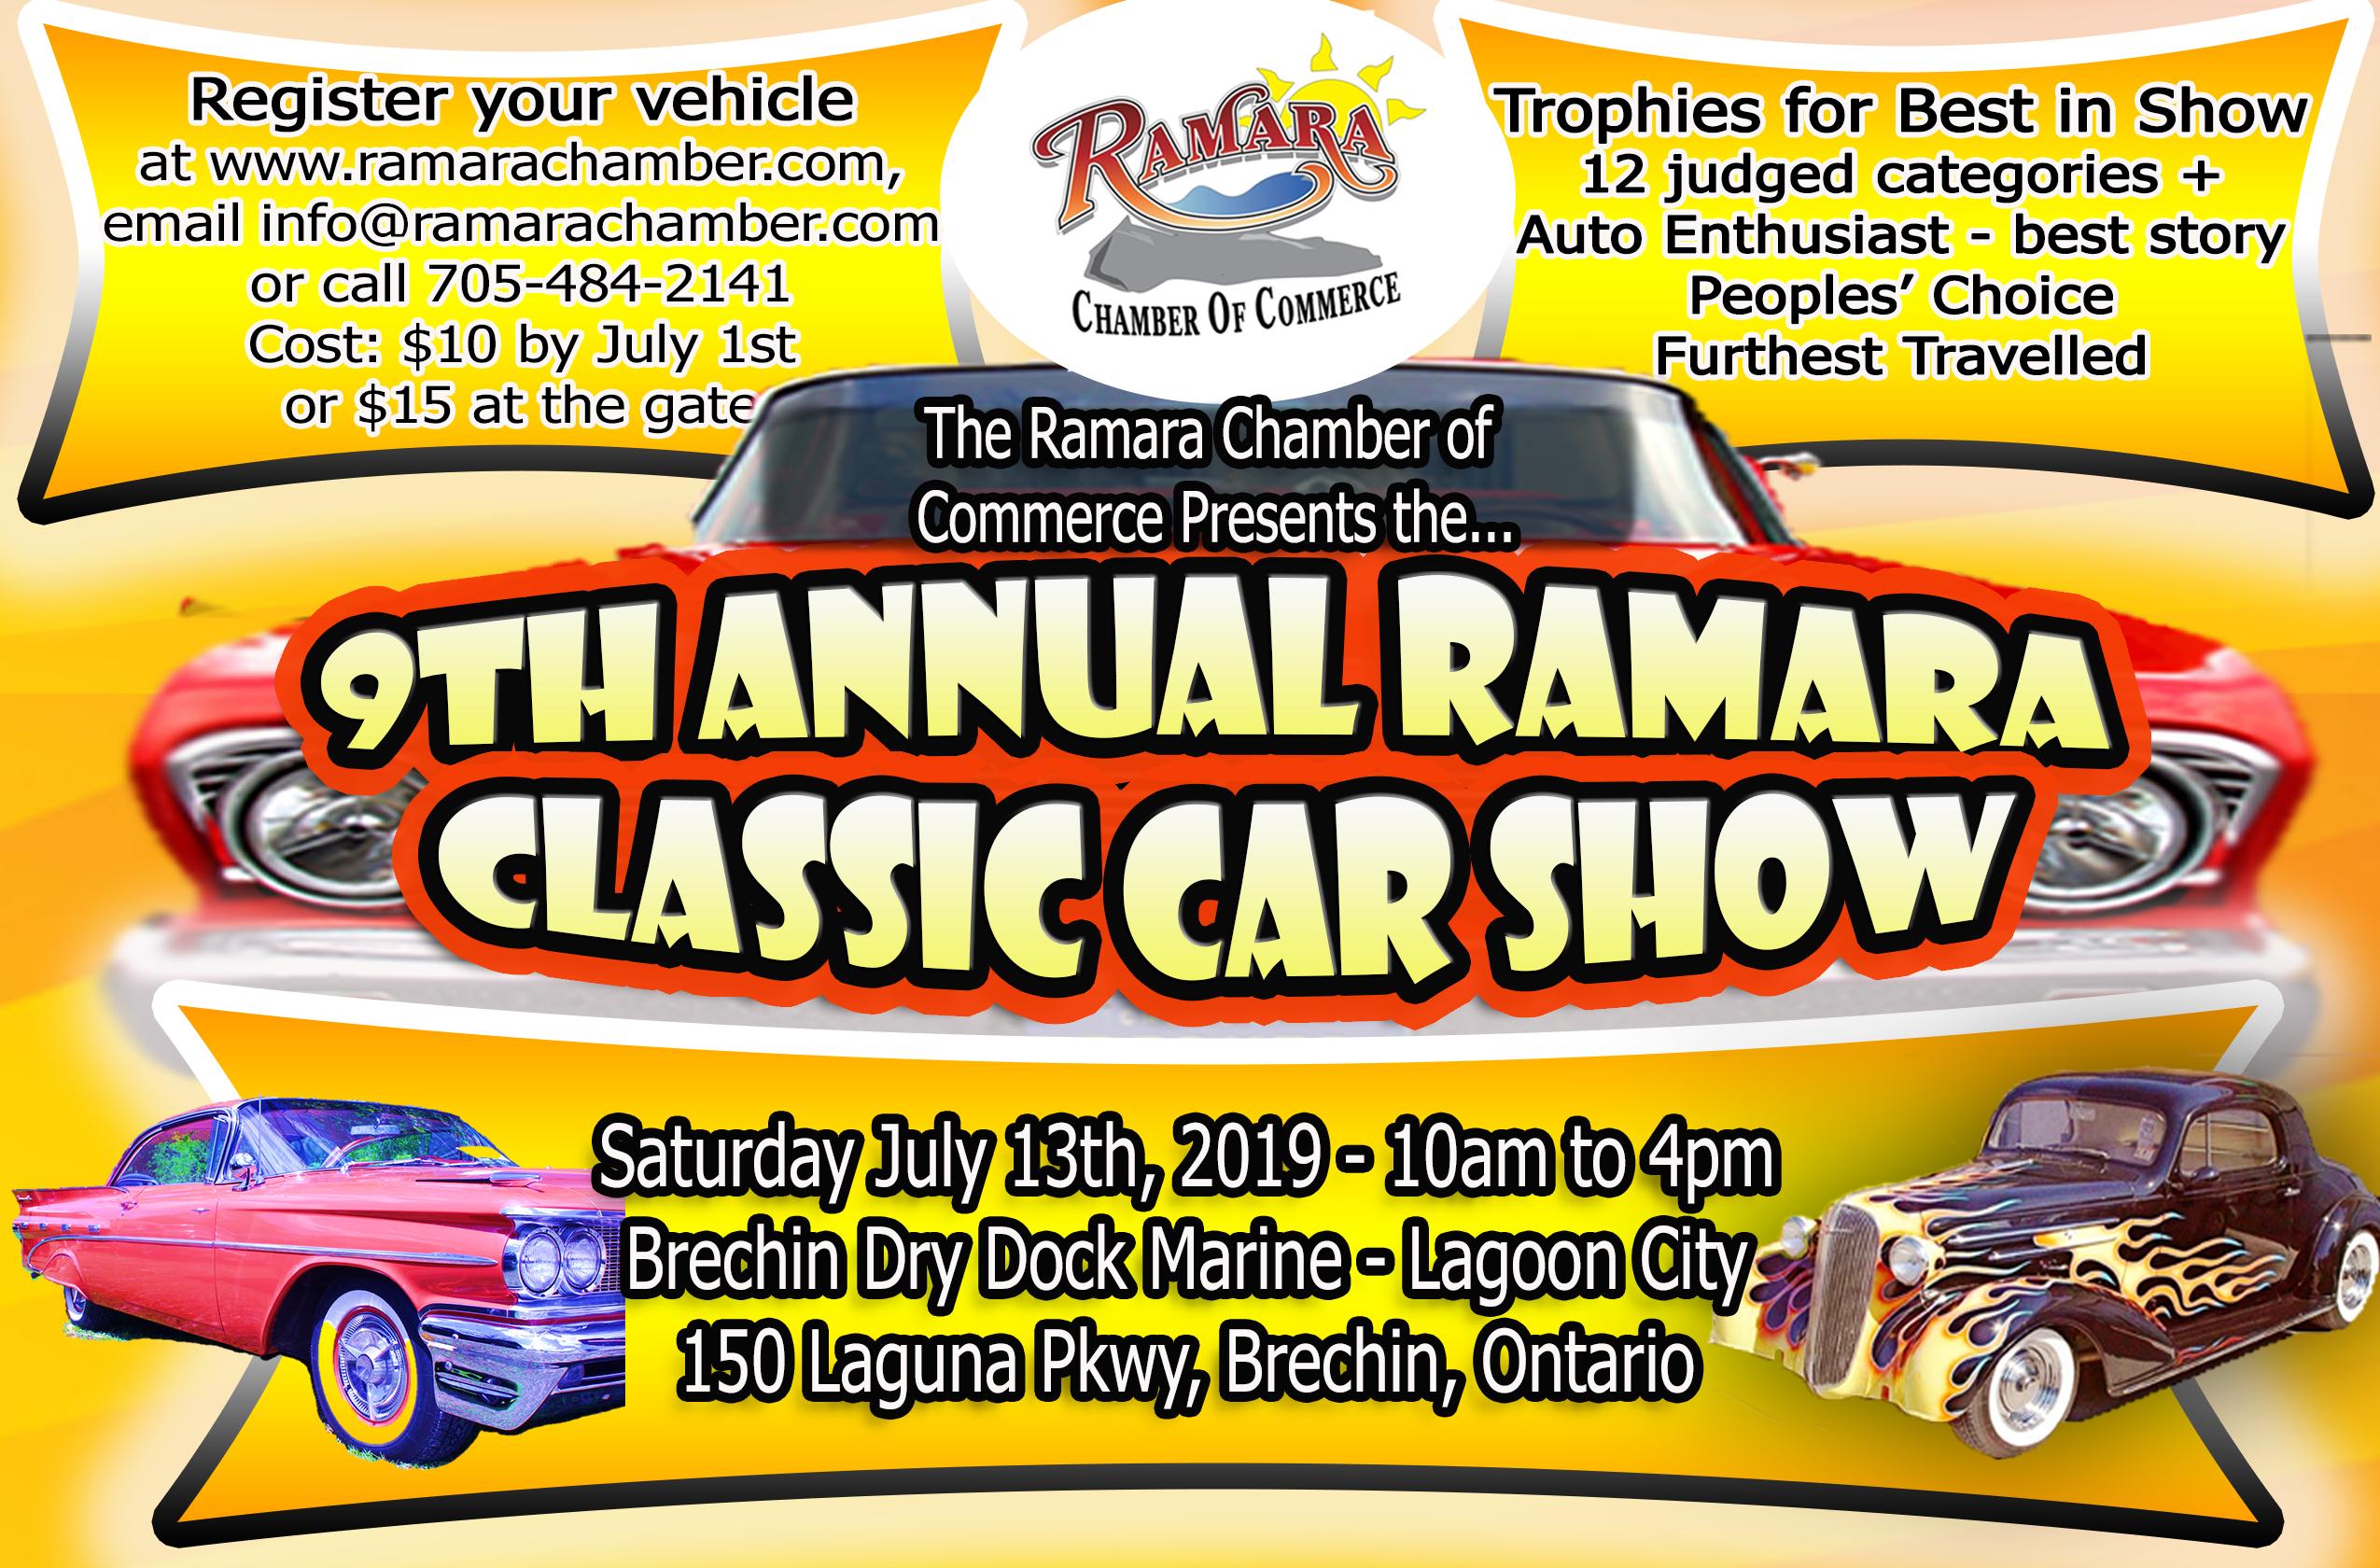 2019 Car Show Admission half page old autos2 1 - 9TH ANNUAL RAMARA CLASSIC CAR SHOW